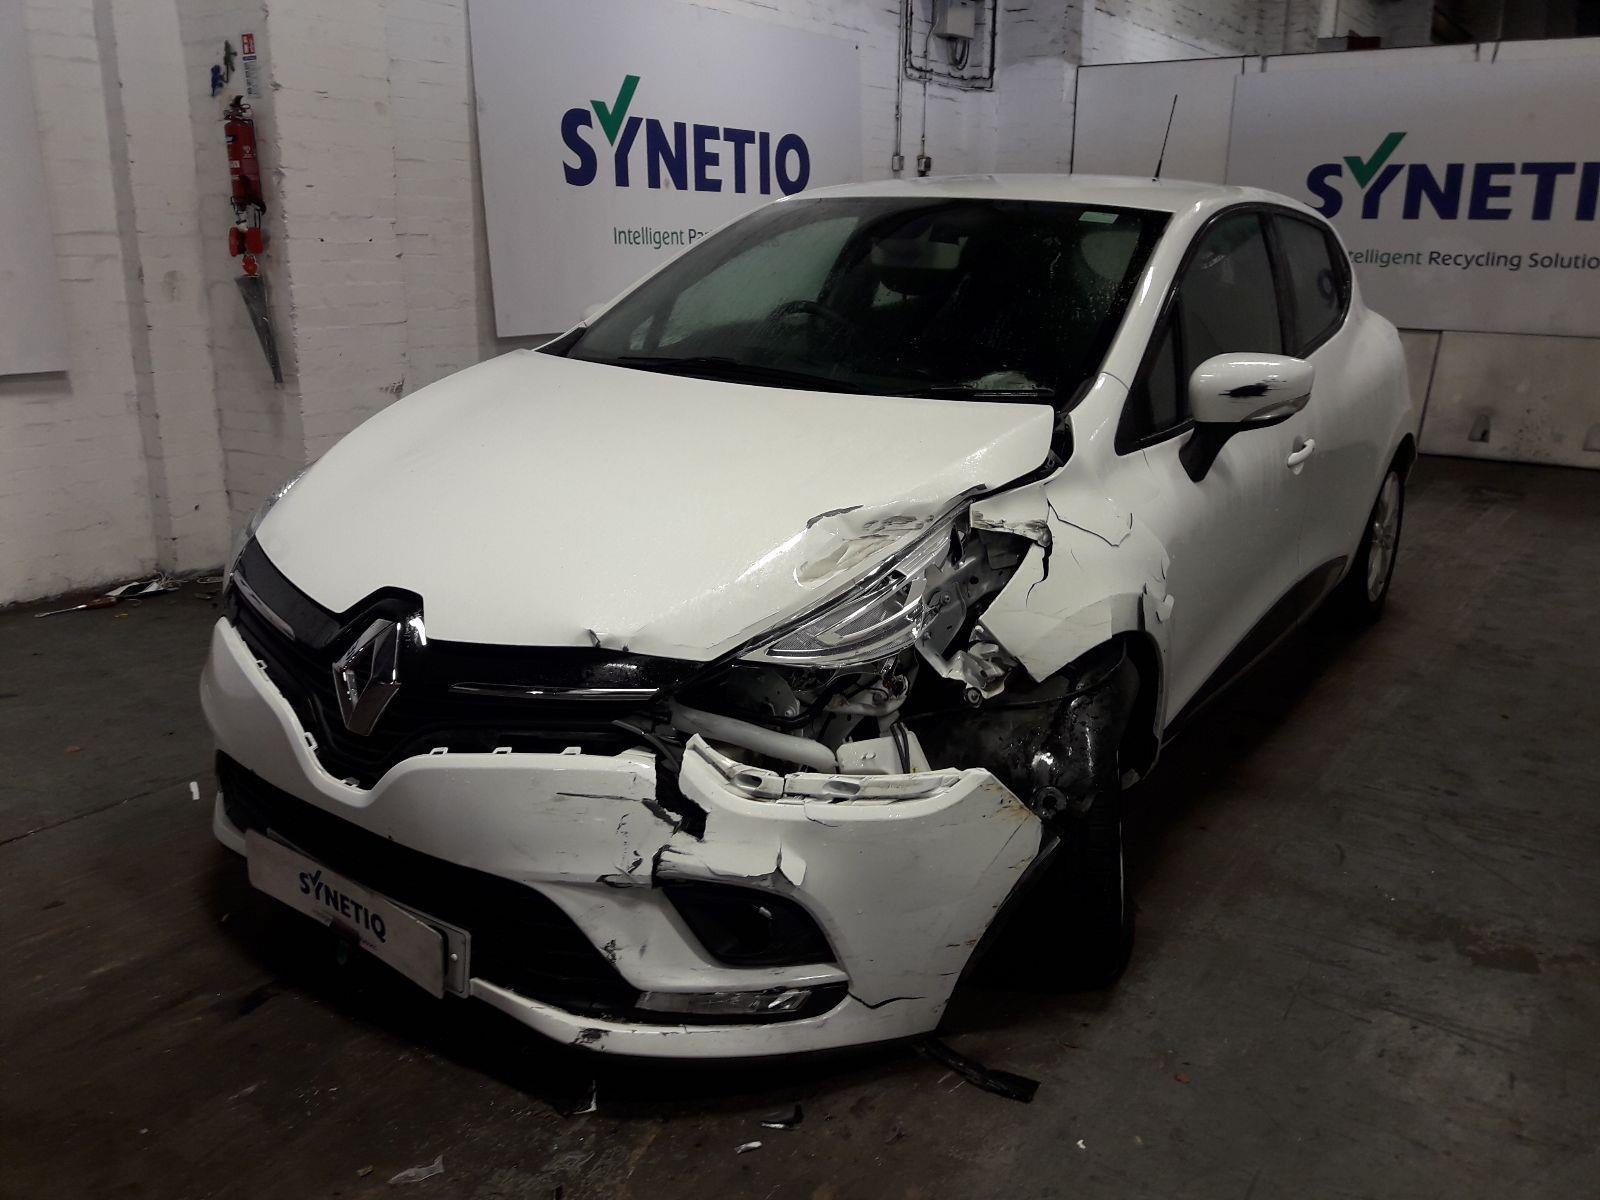 Synetiq Renault Mk4 Ph1 X98 2012 To 2019 Dynamique Nav Tce Wheel Hub Front Rh Petrol Manual For Sale